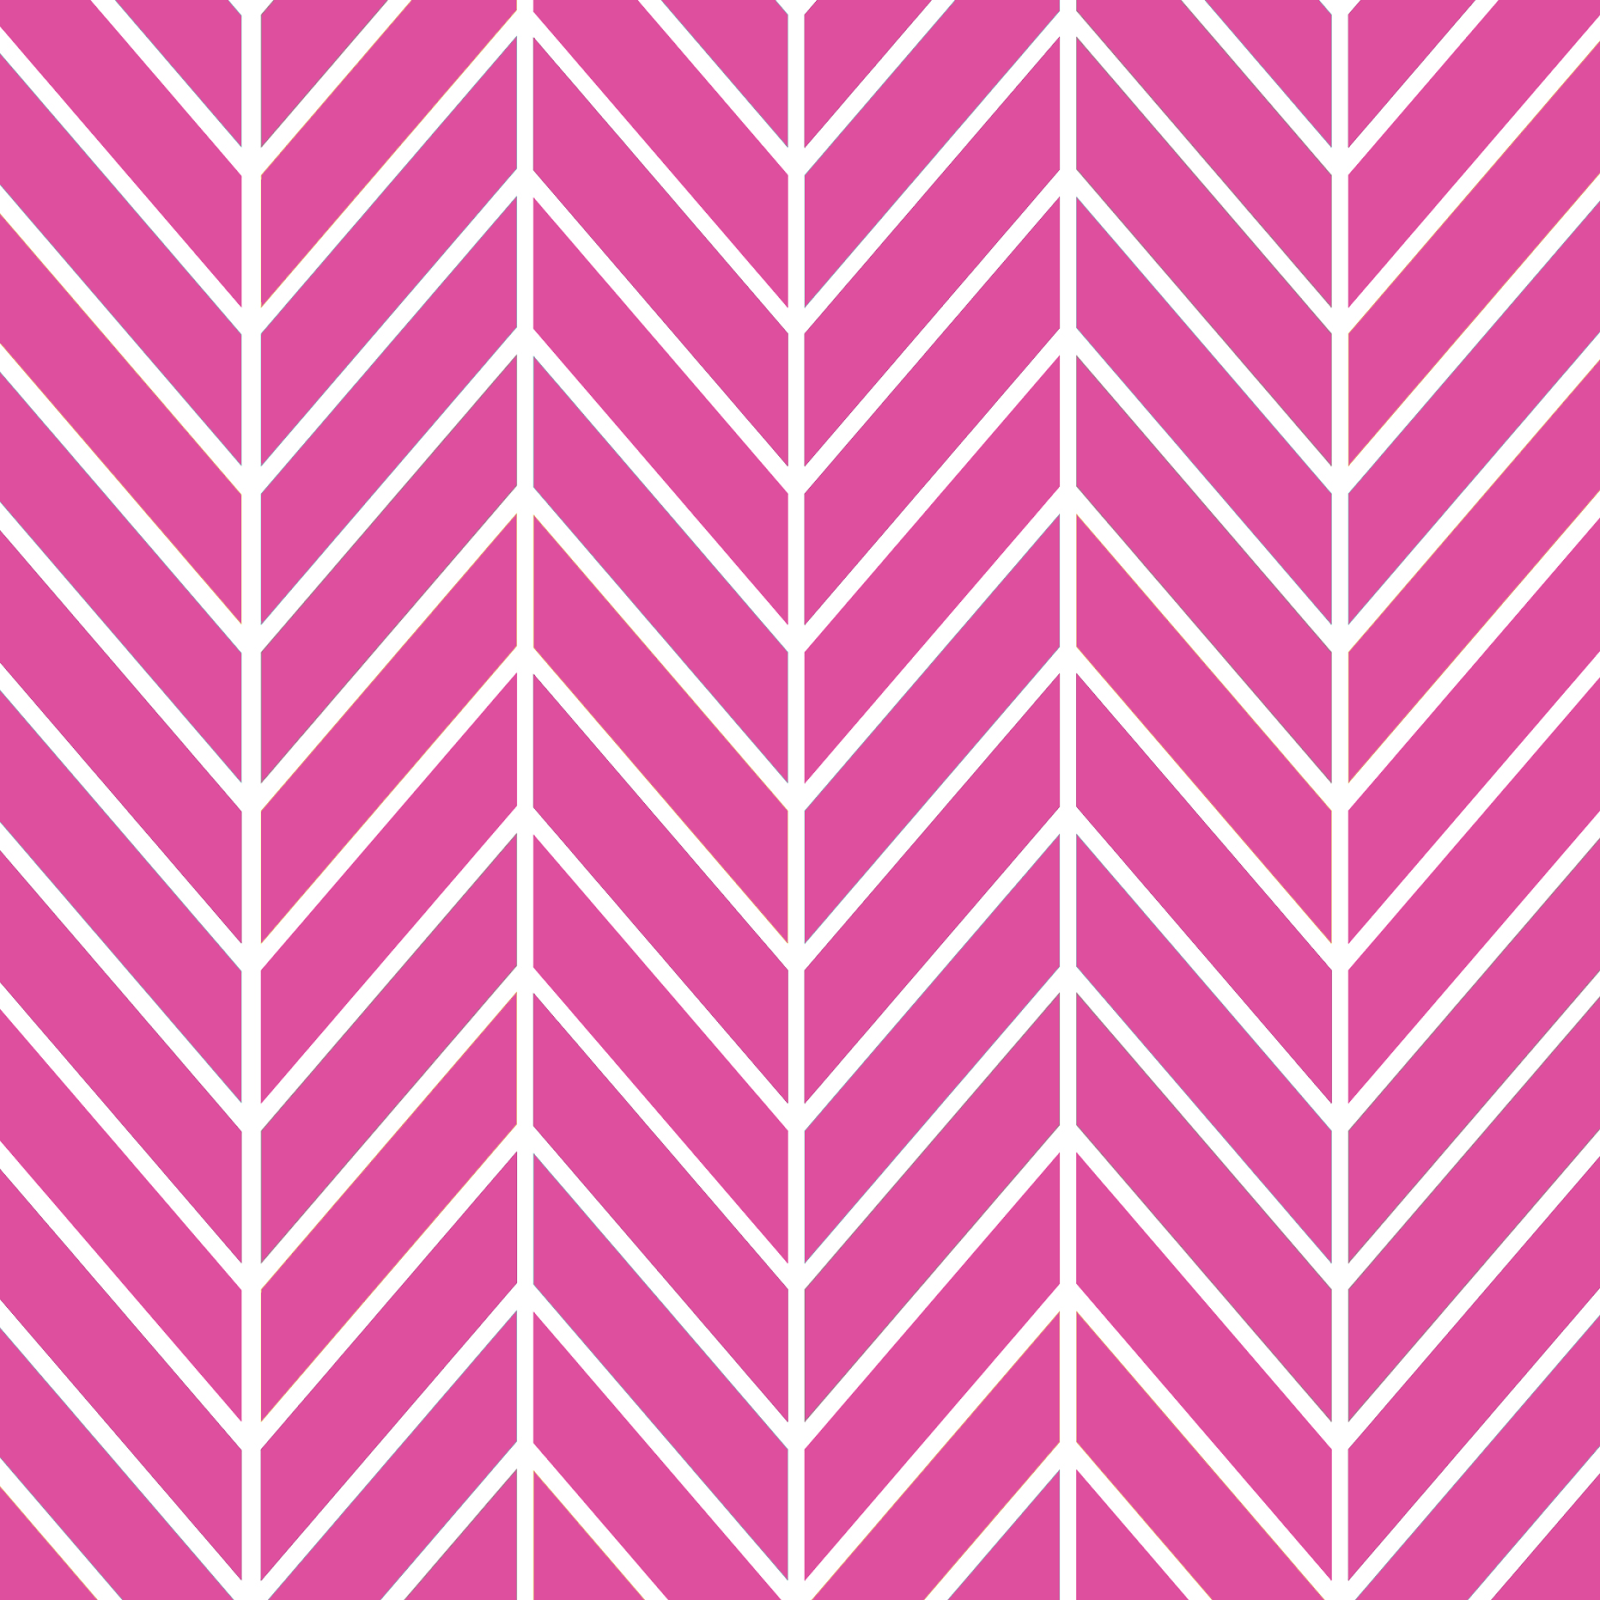 Squares clipart dark pink Pink hot+pink+trendy+patterns+freebies+herringbone+chevron+pattern Pinterest iPhone/Desktop patterns